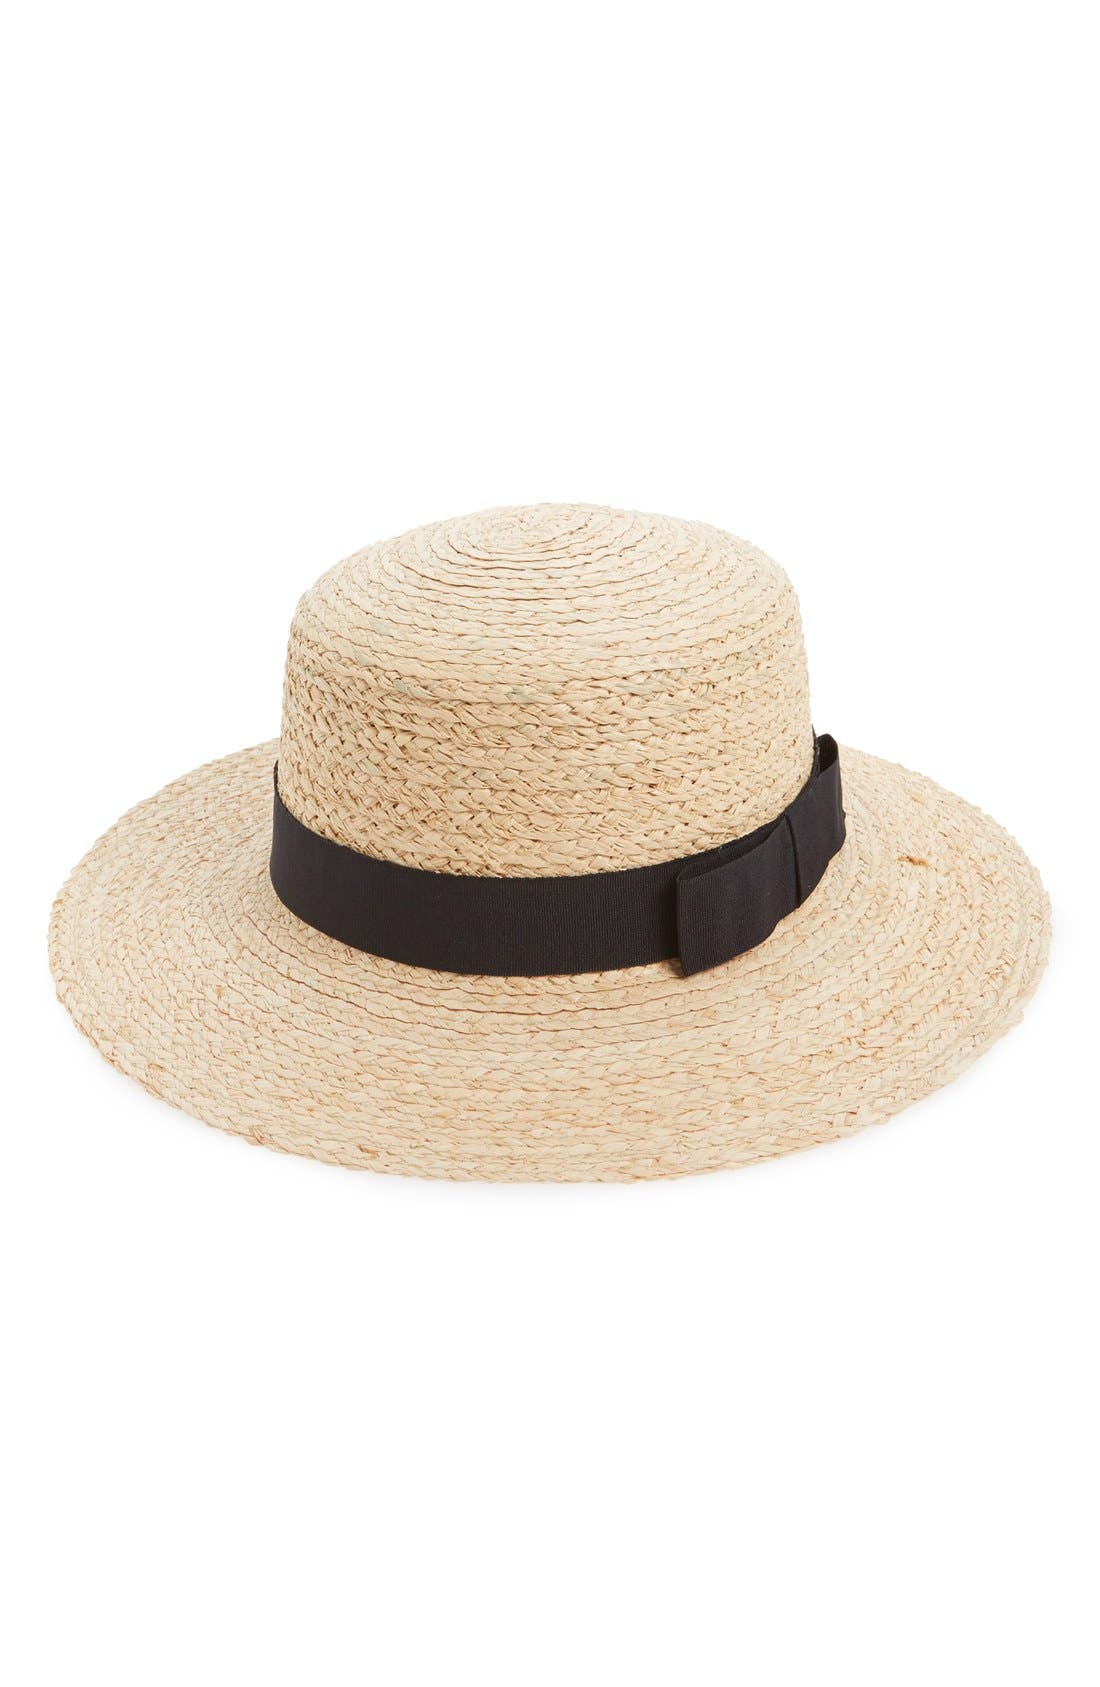 Main Image - Sole Society Floppy Straw Hat